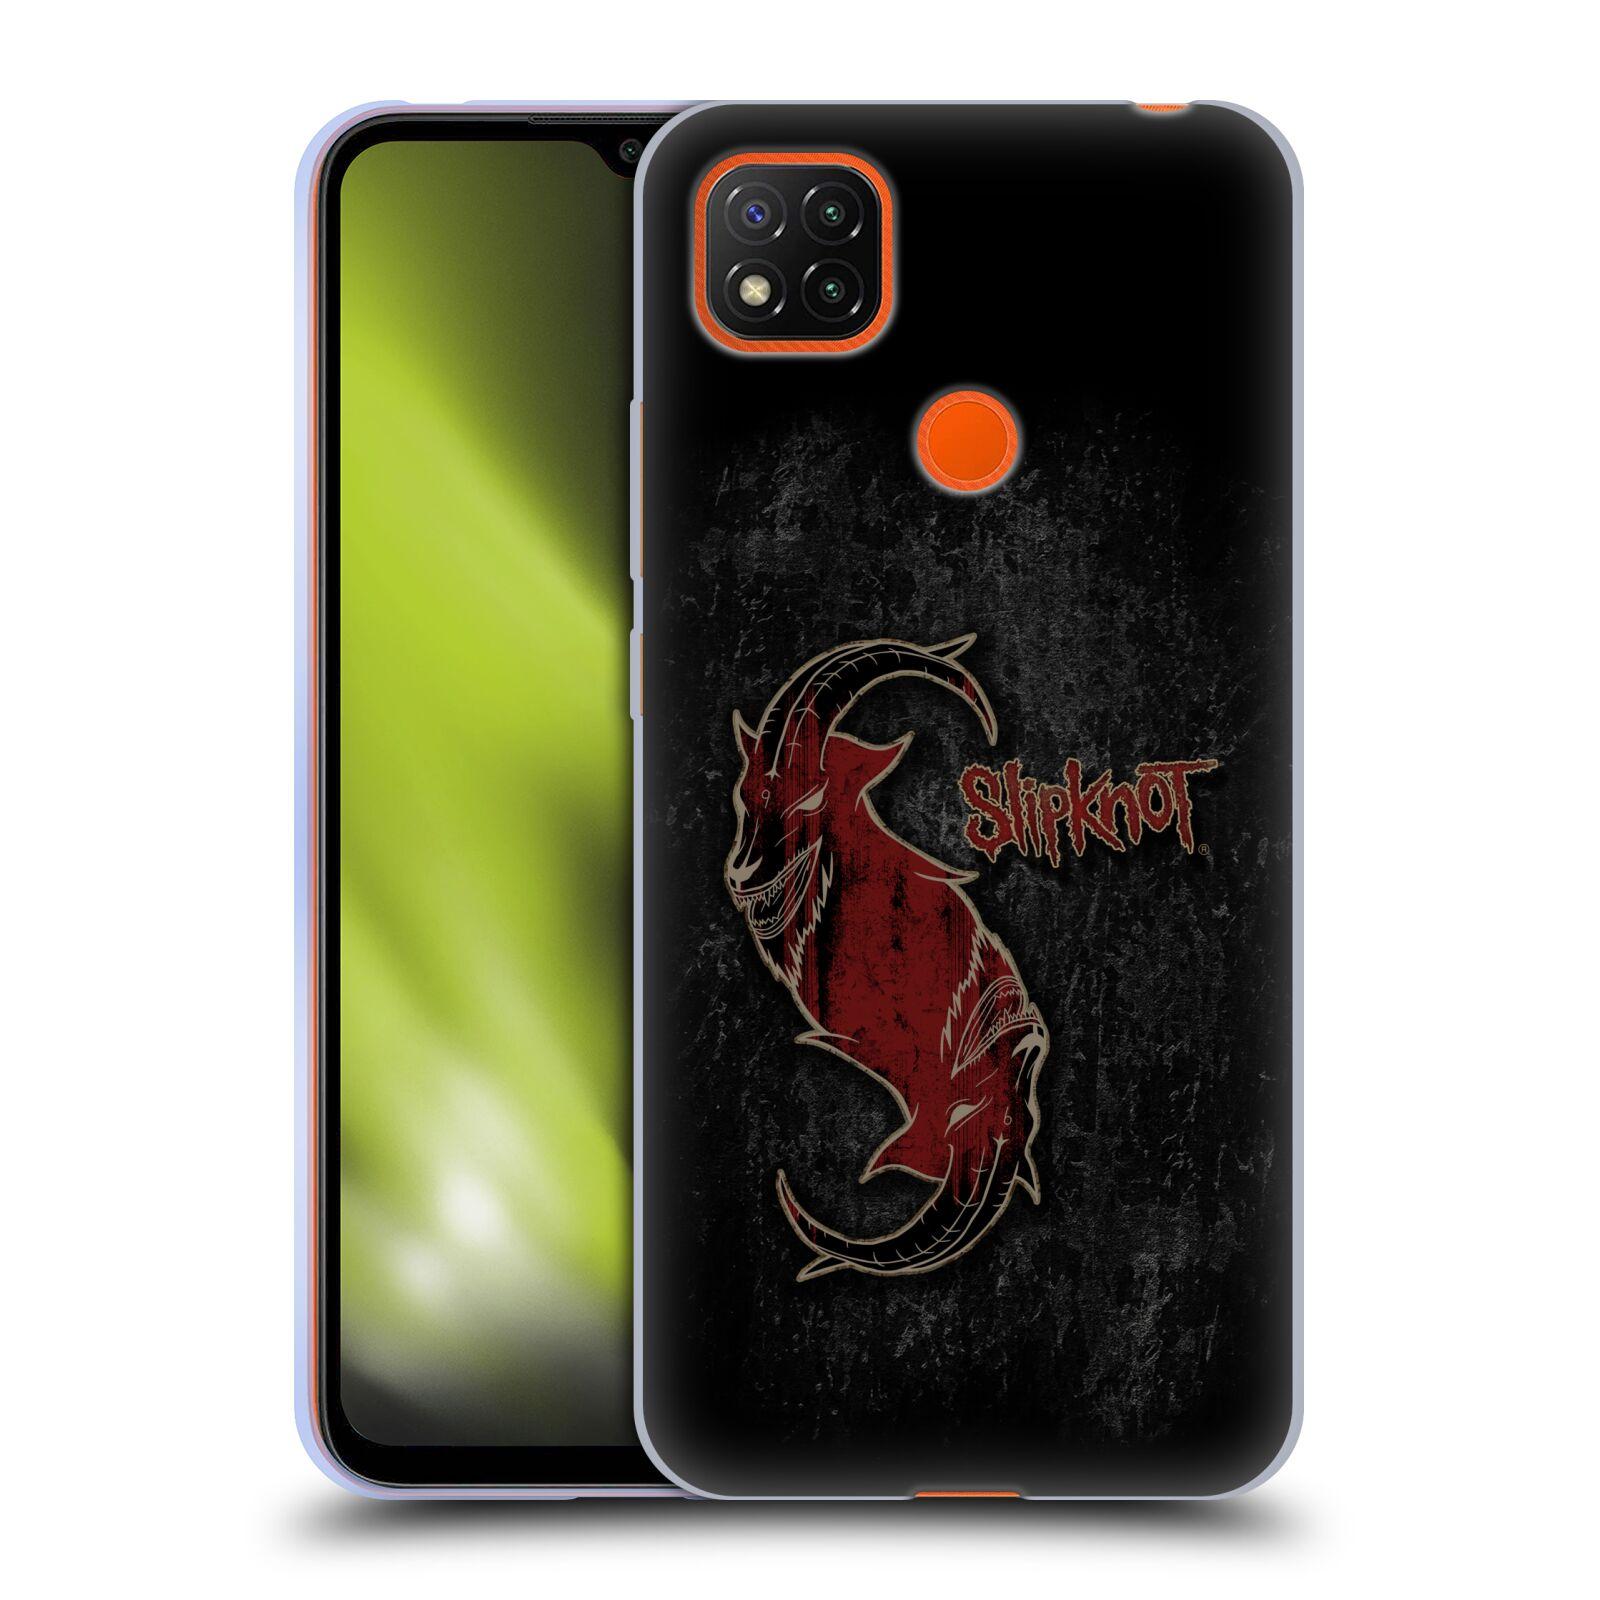 Silikonové pouzdro na mobil Xiaomi Redmi 9C - Head Case - Slipknot - Rudý kozel